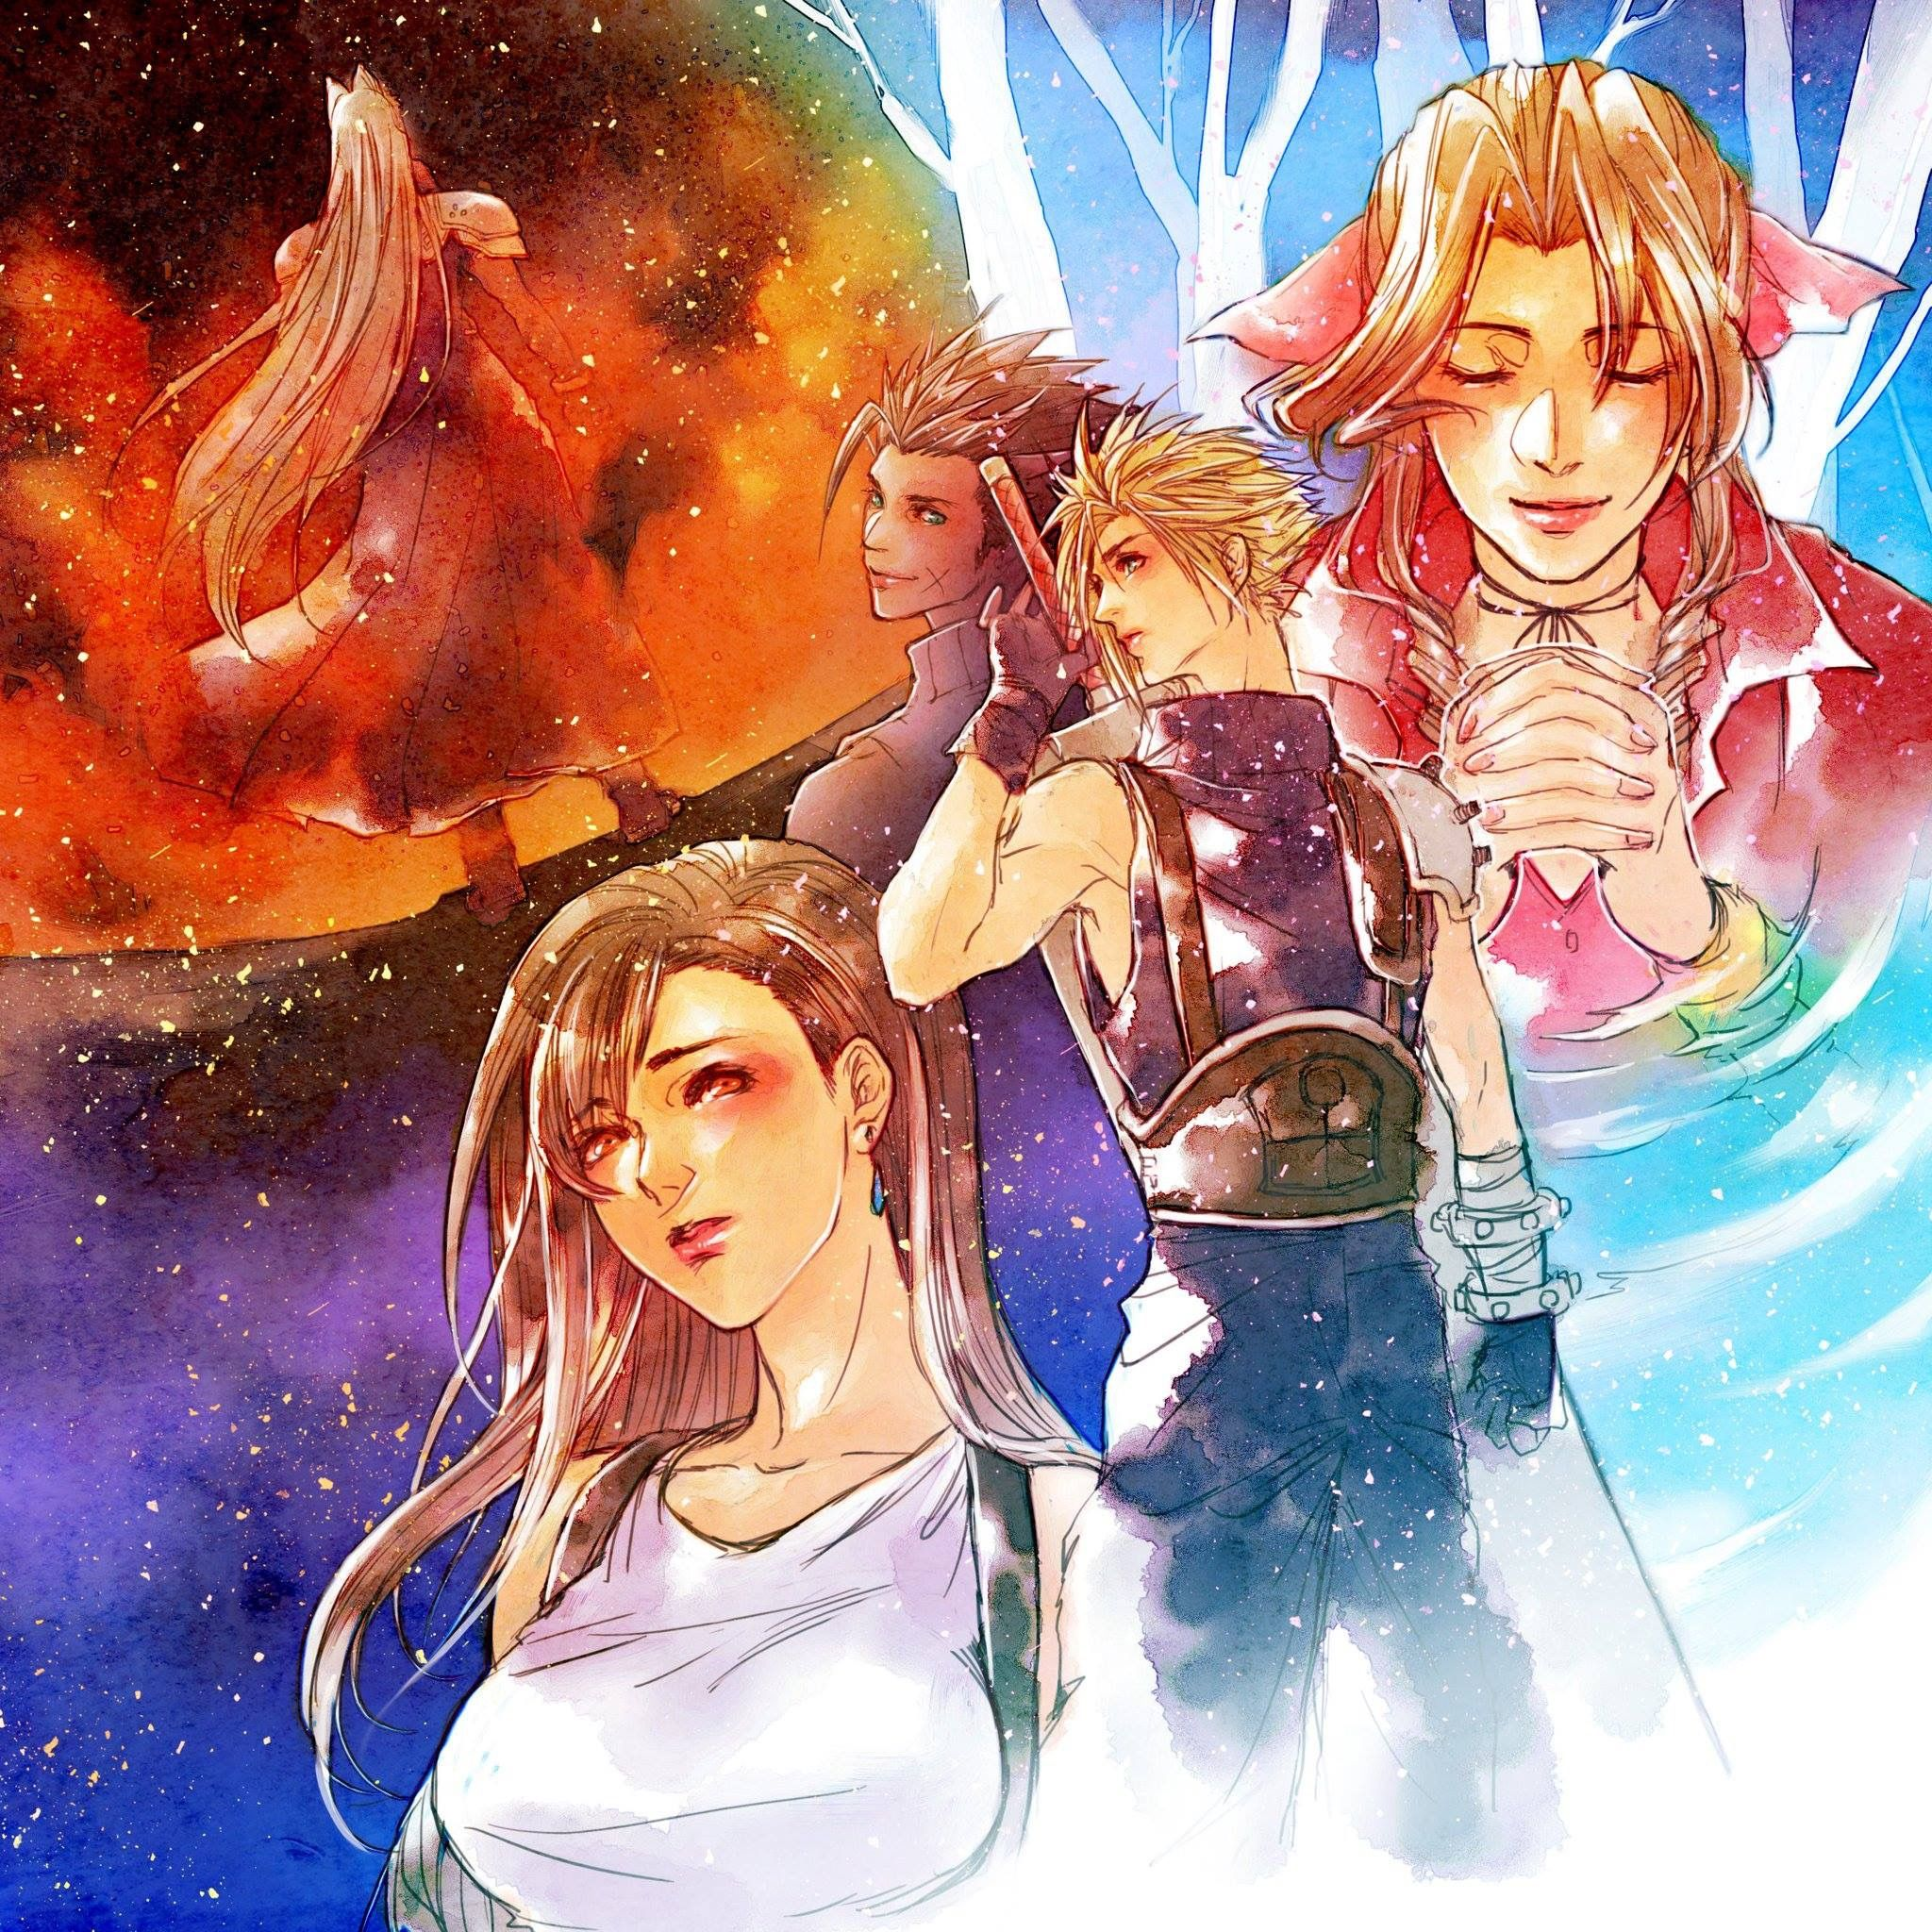 Pin by Death Angel on FINAL FANTASY XV | Final fantasy